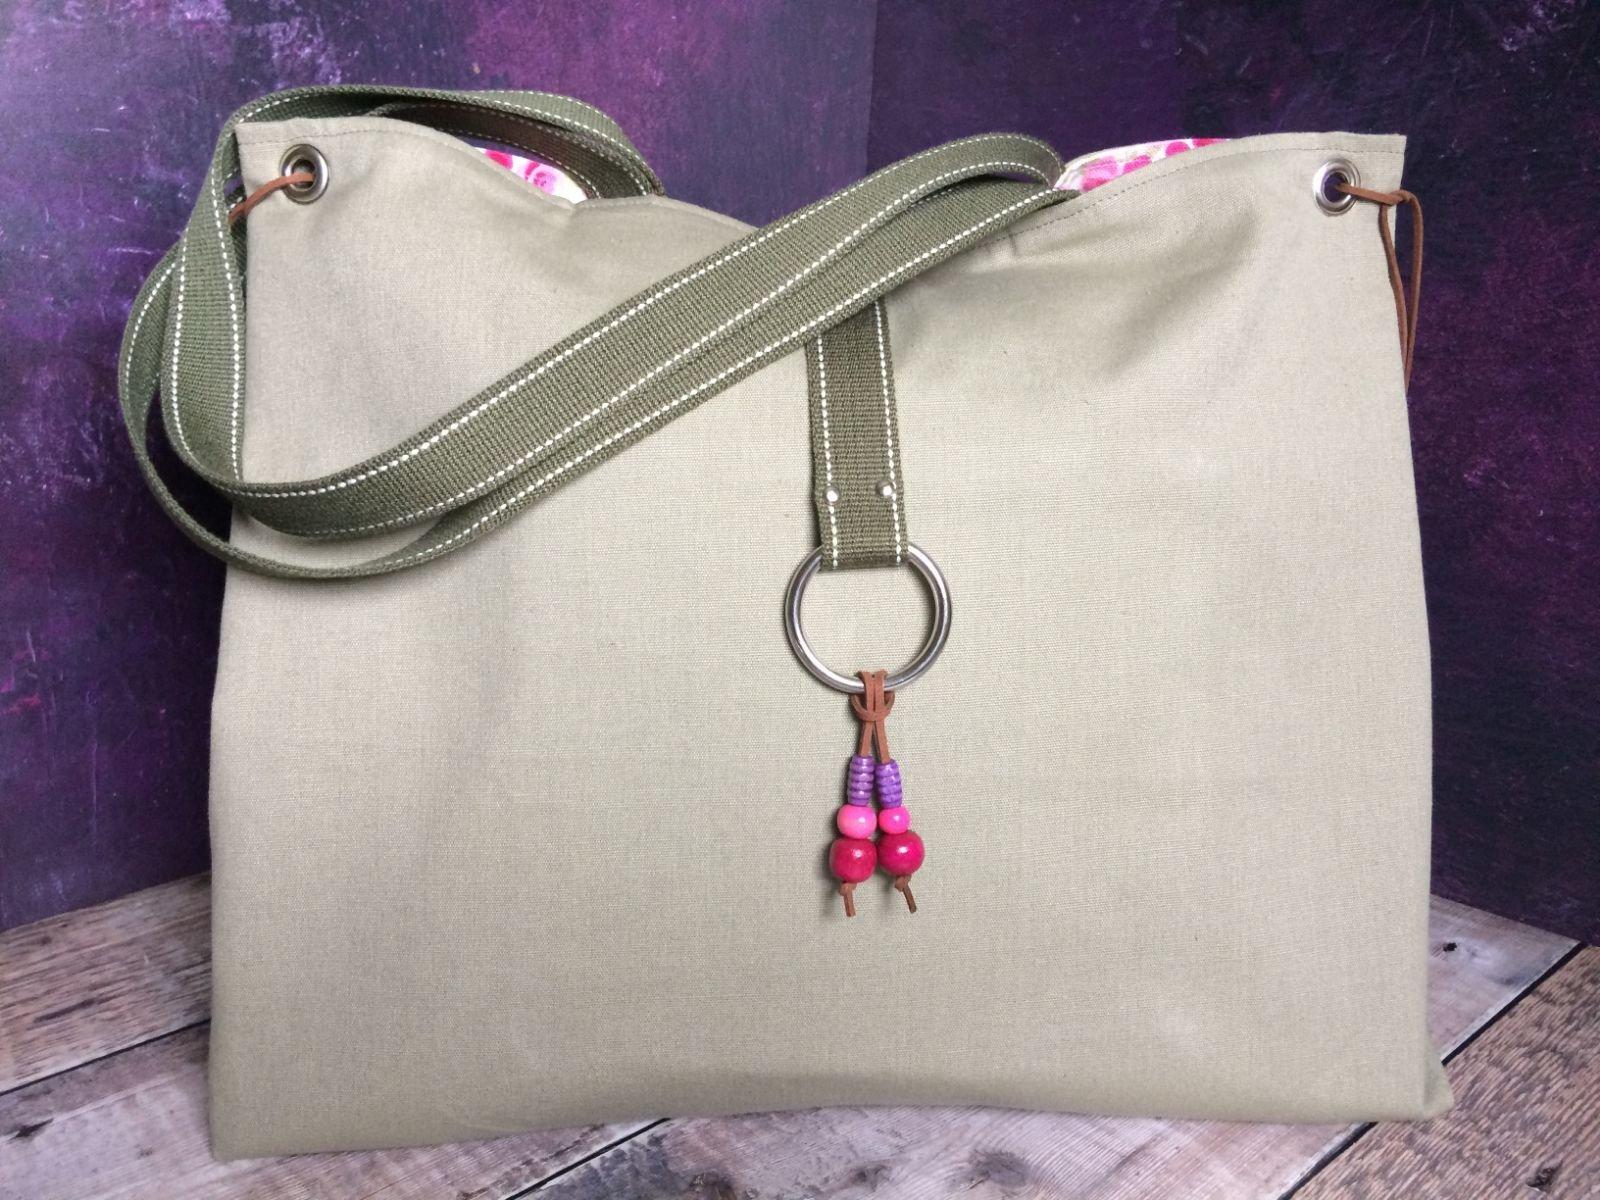 Khaki Tote Bag 'SOLD'